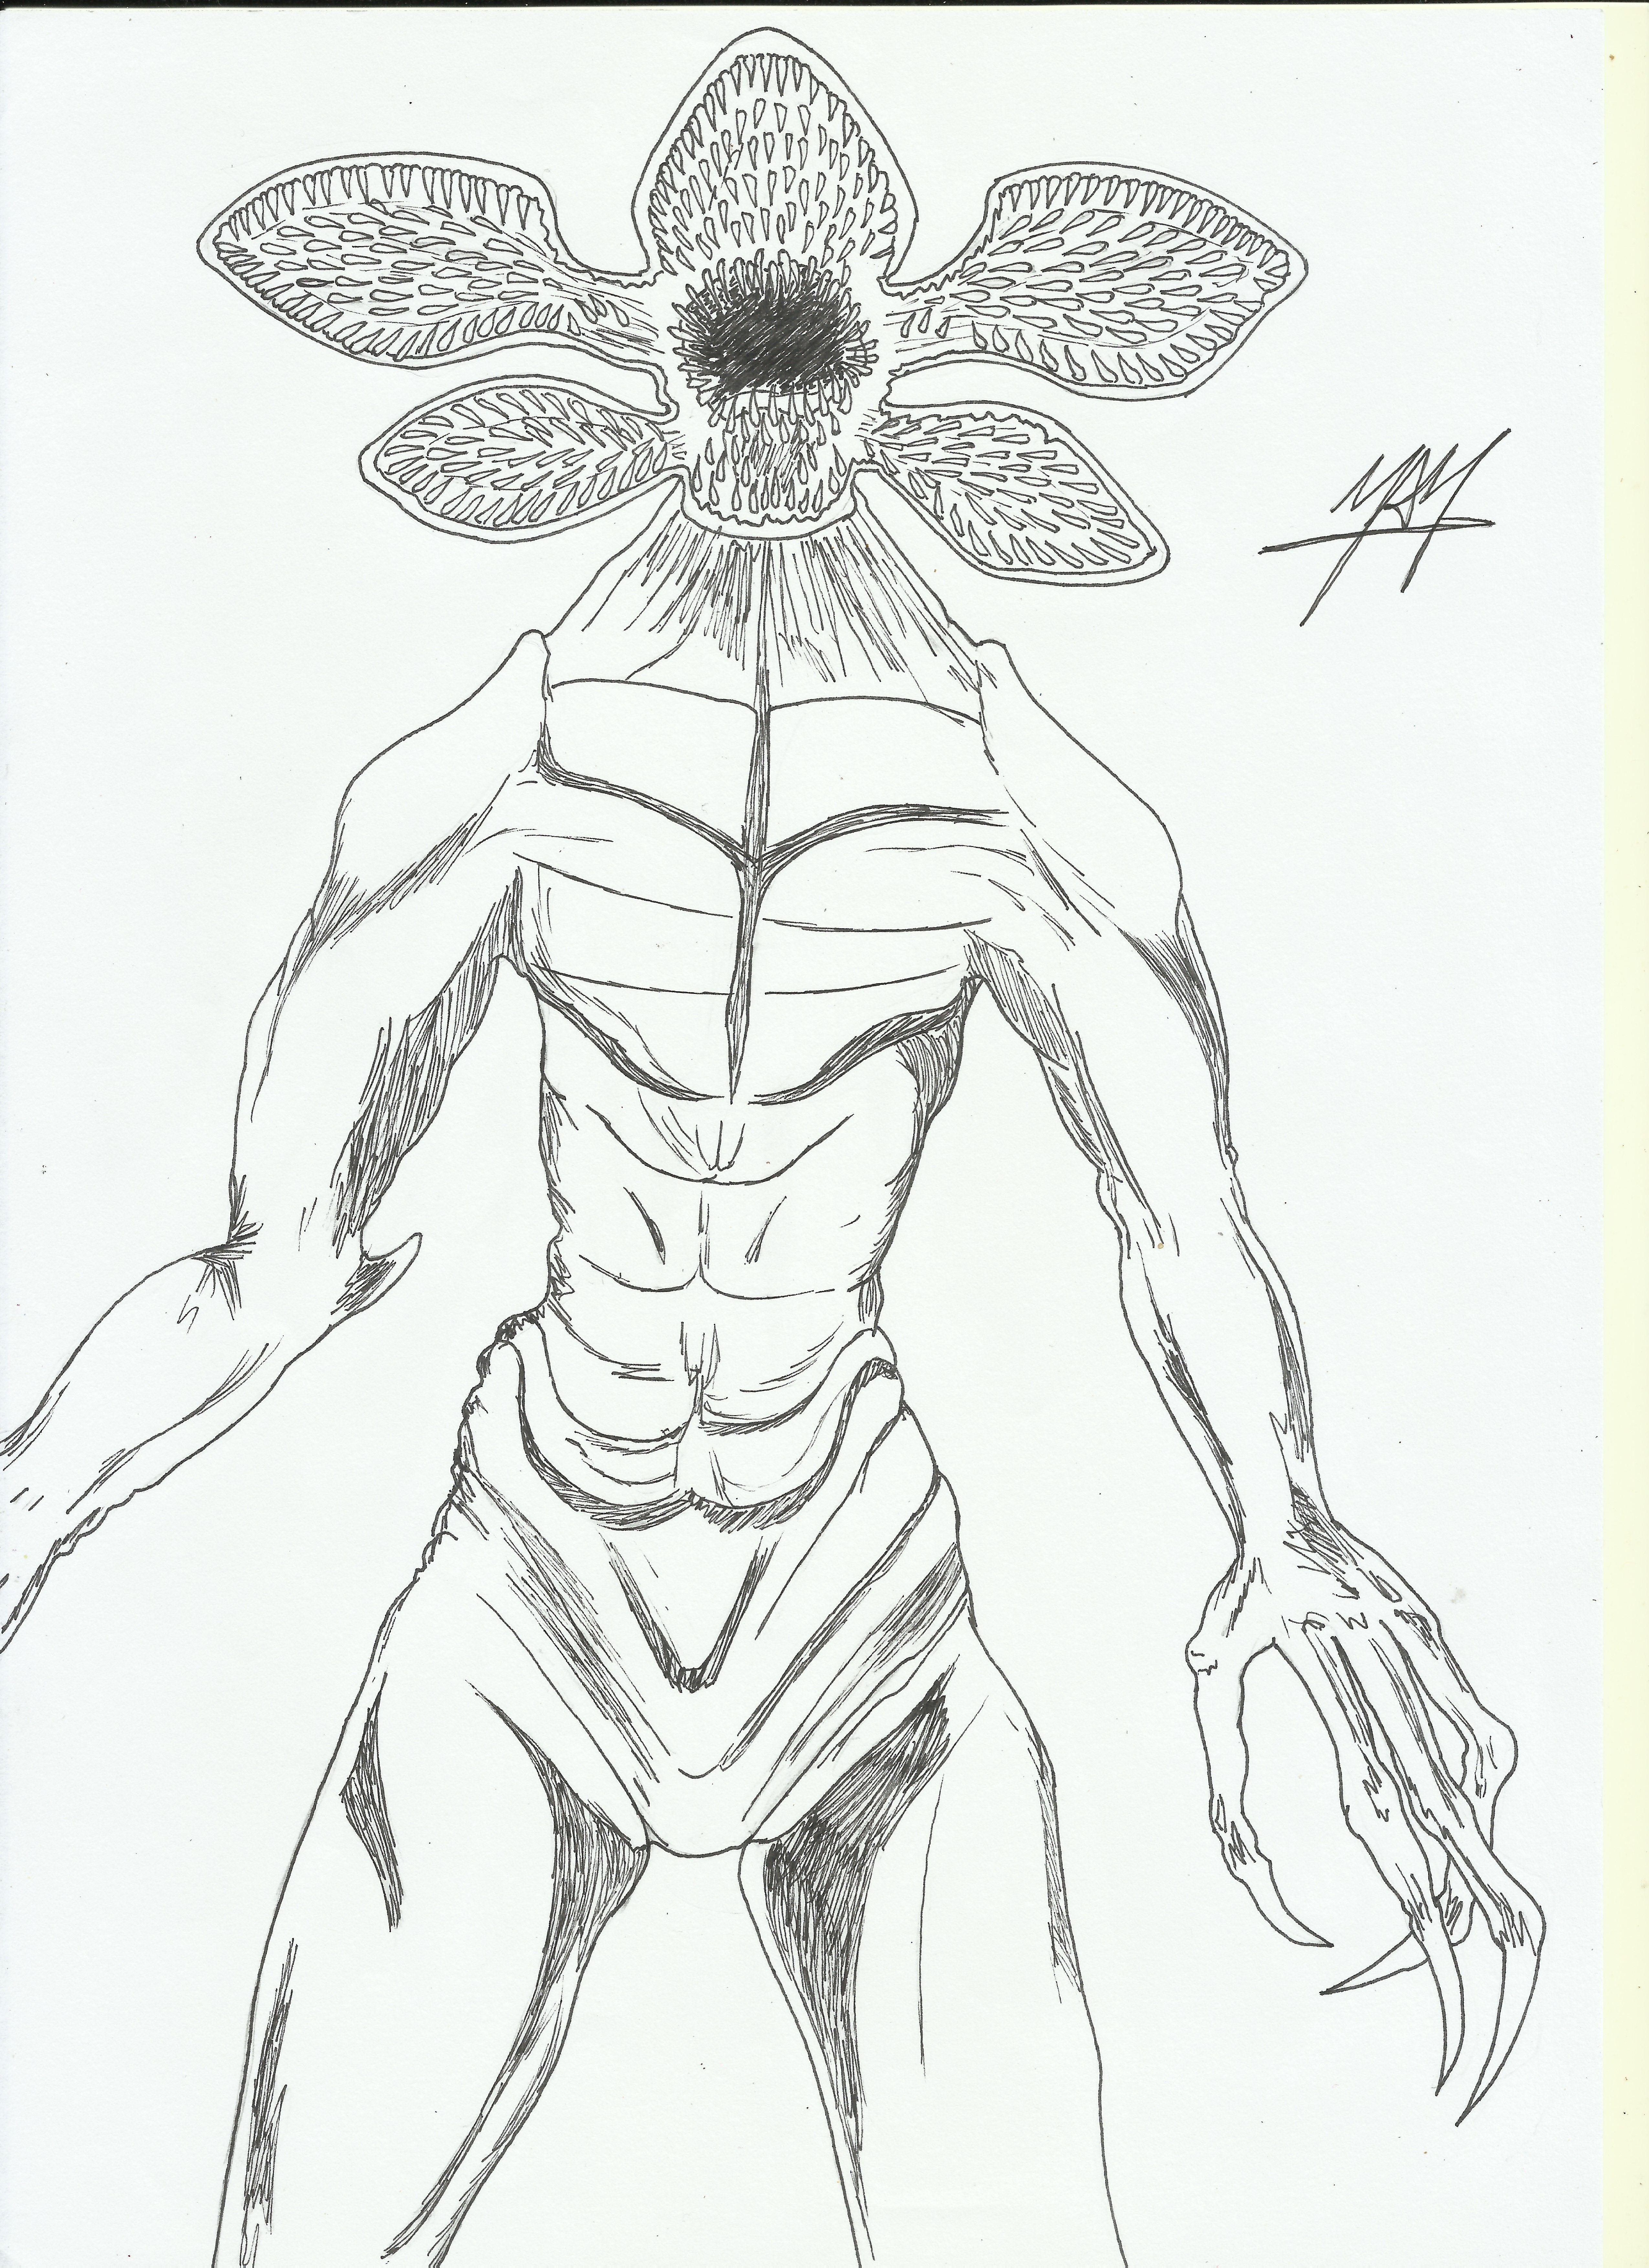 My Sketch Of Demogorgon Form Stranger Things Series Demogorgon